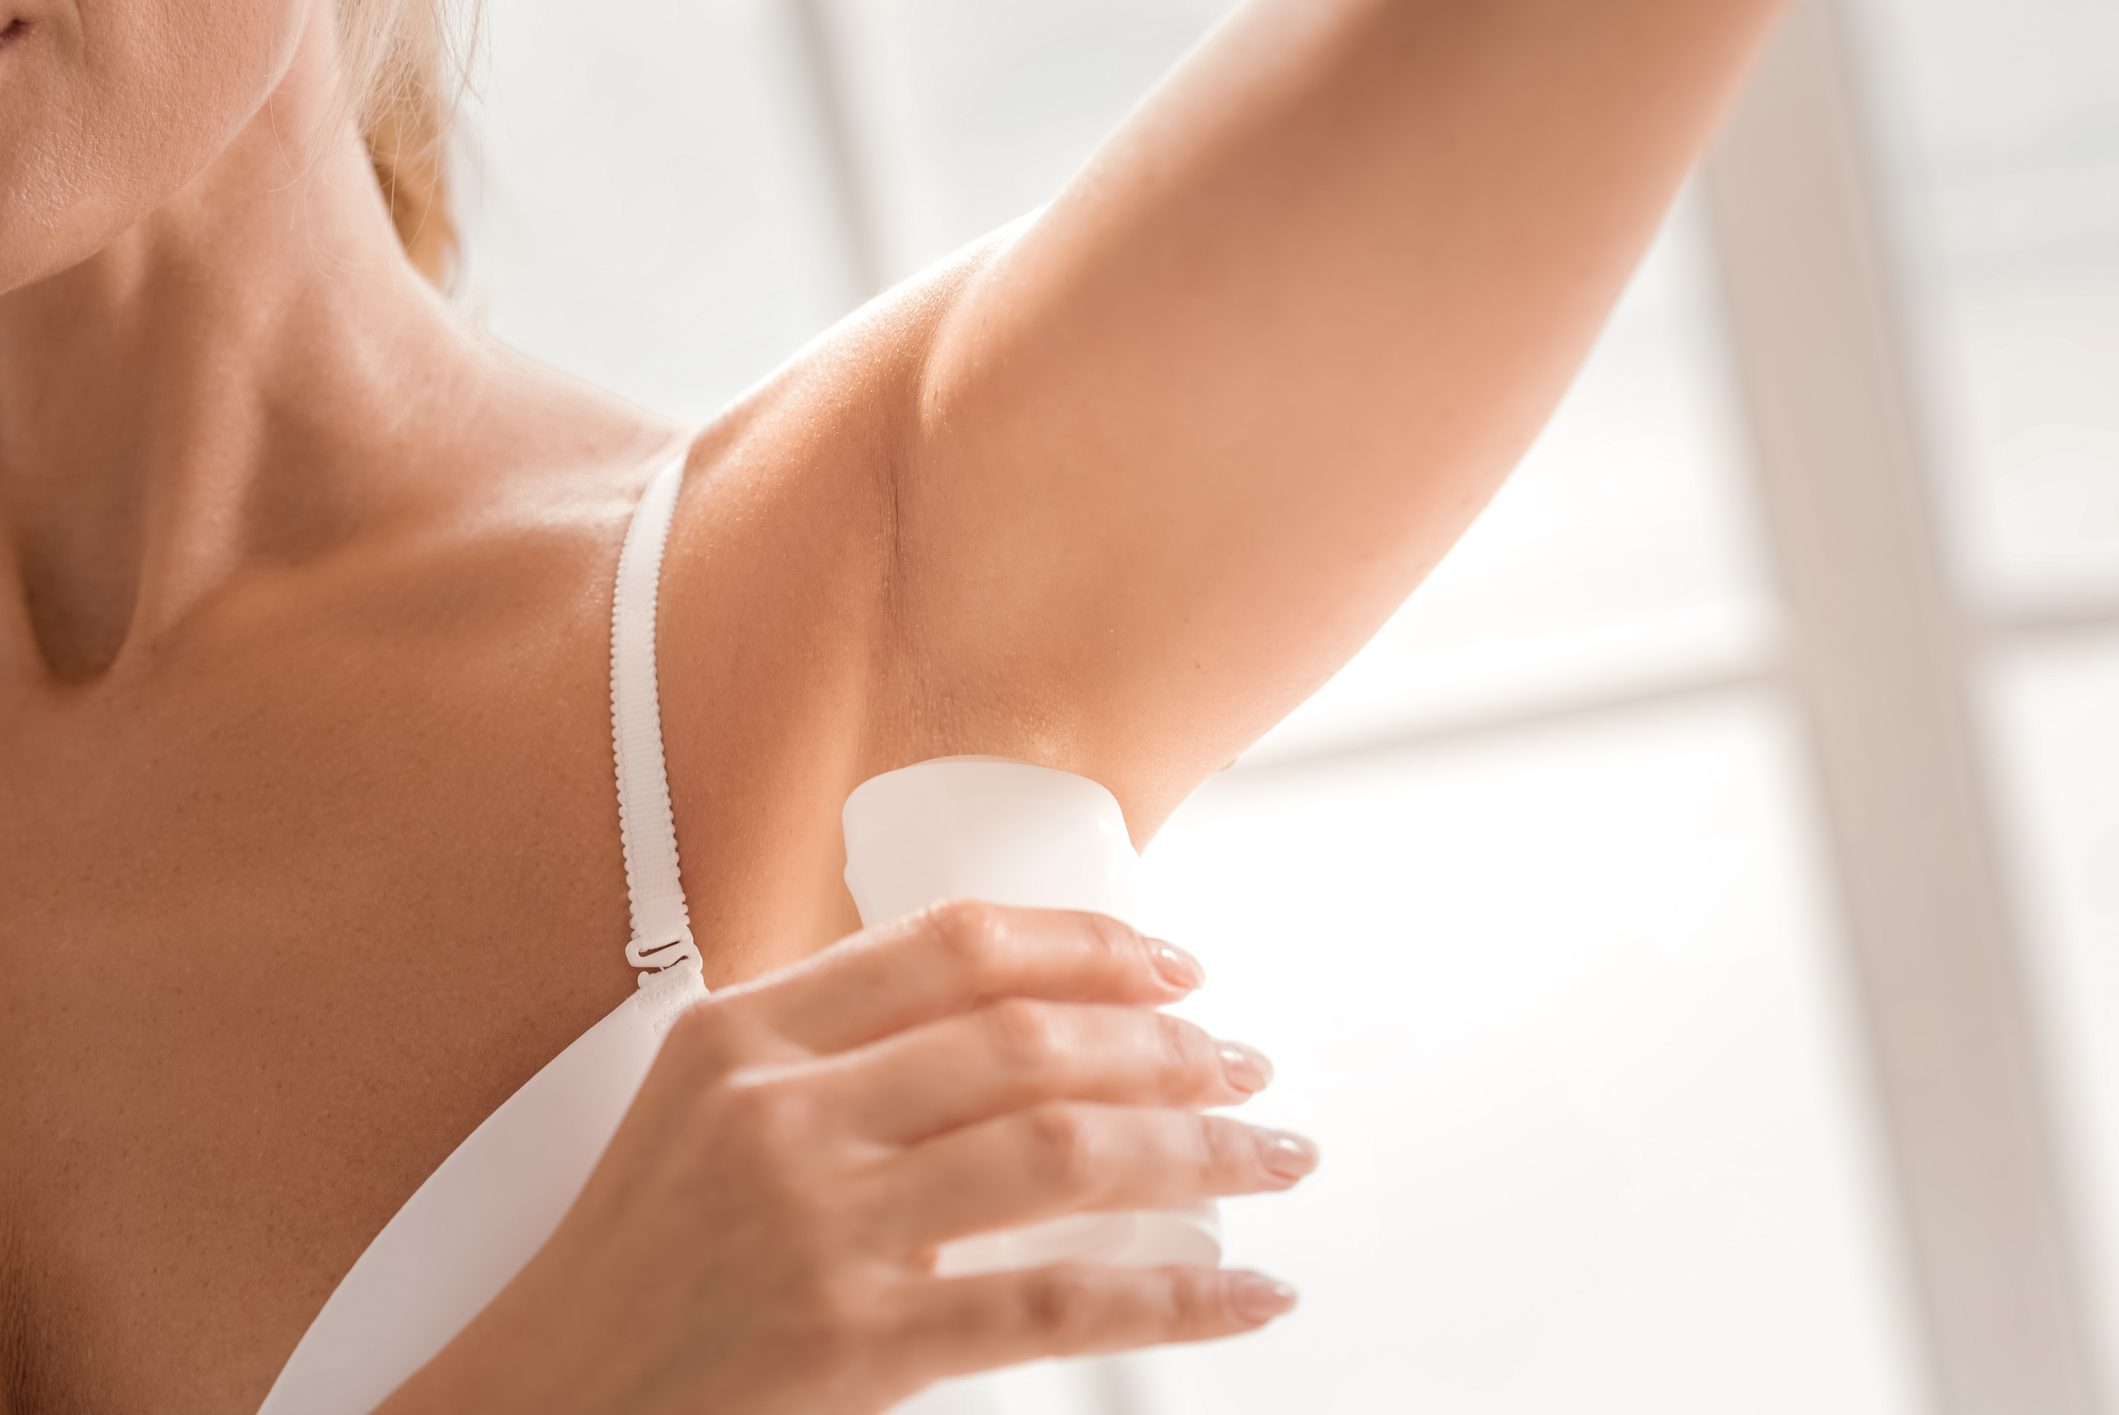 close up of woman applying deoderant